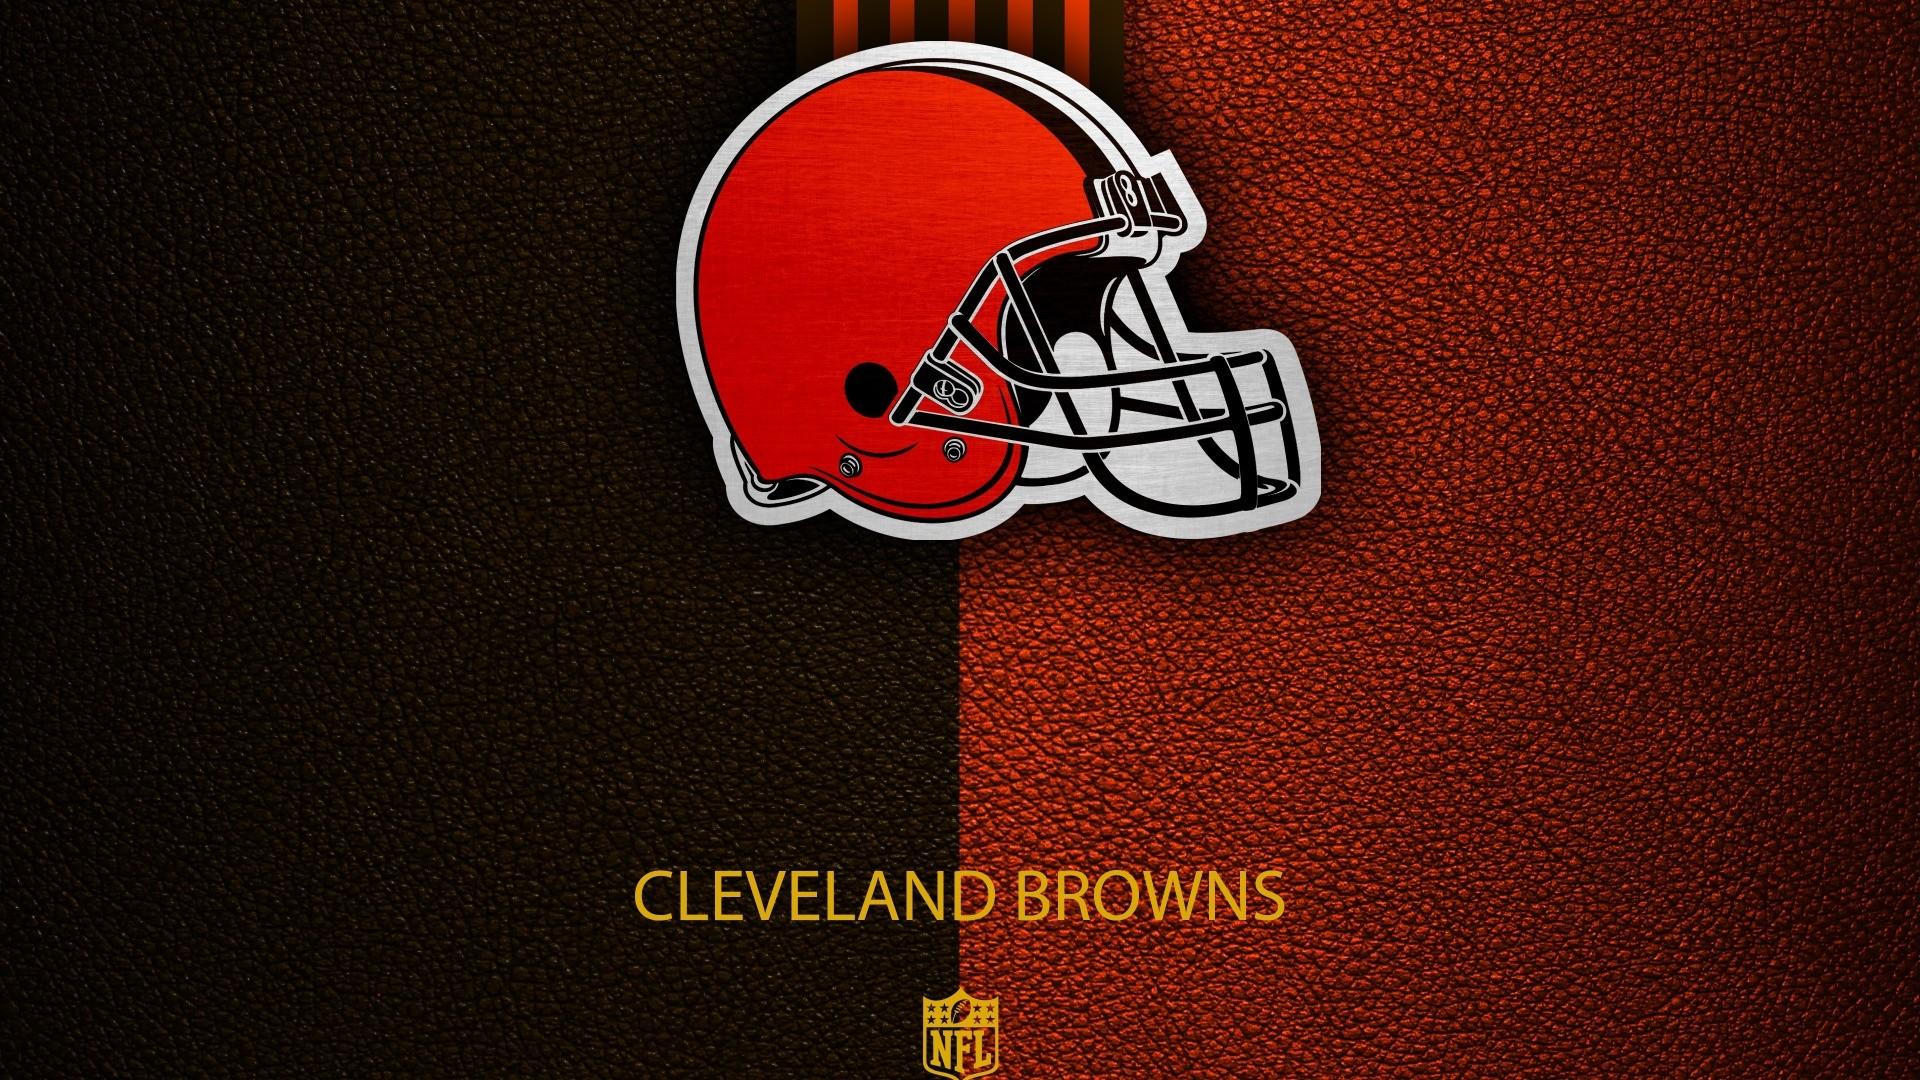 Cleveland Browns Download Wallpaper